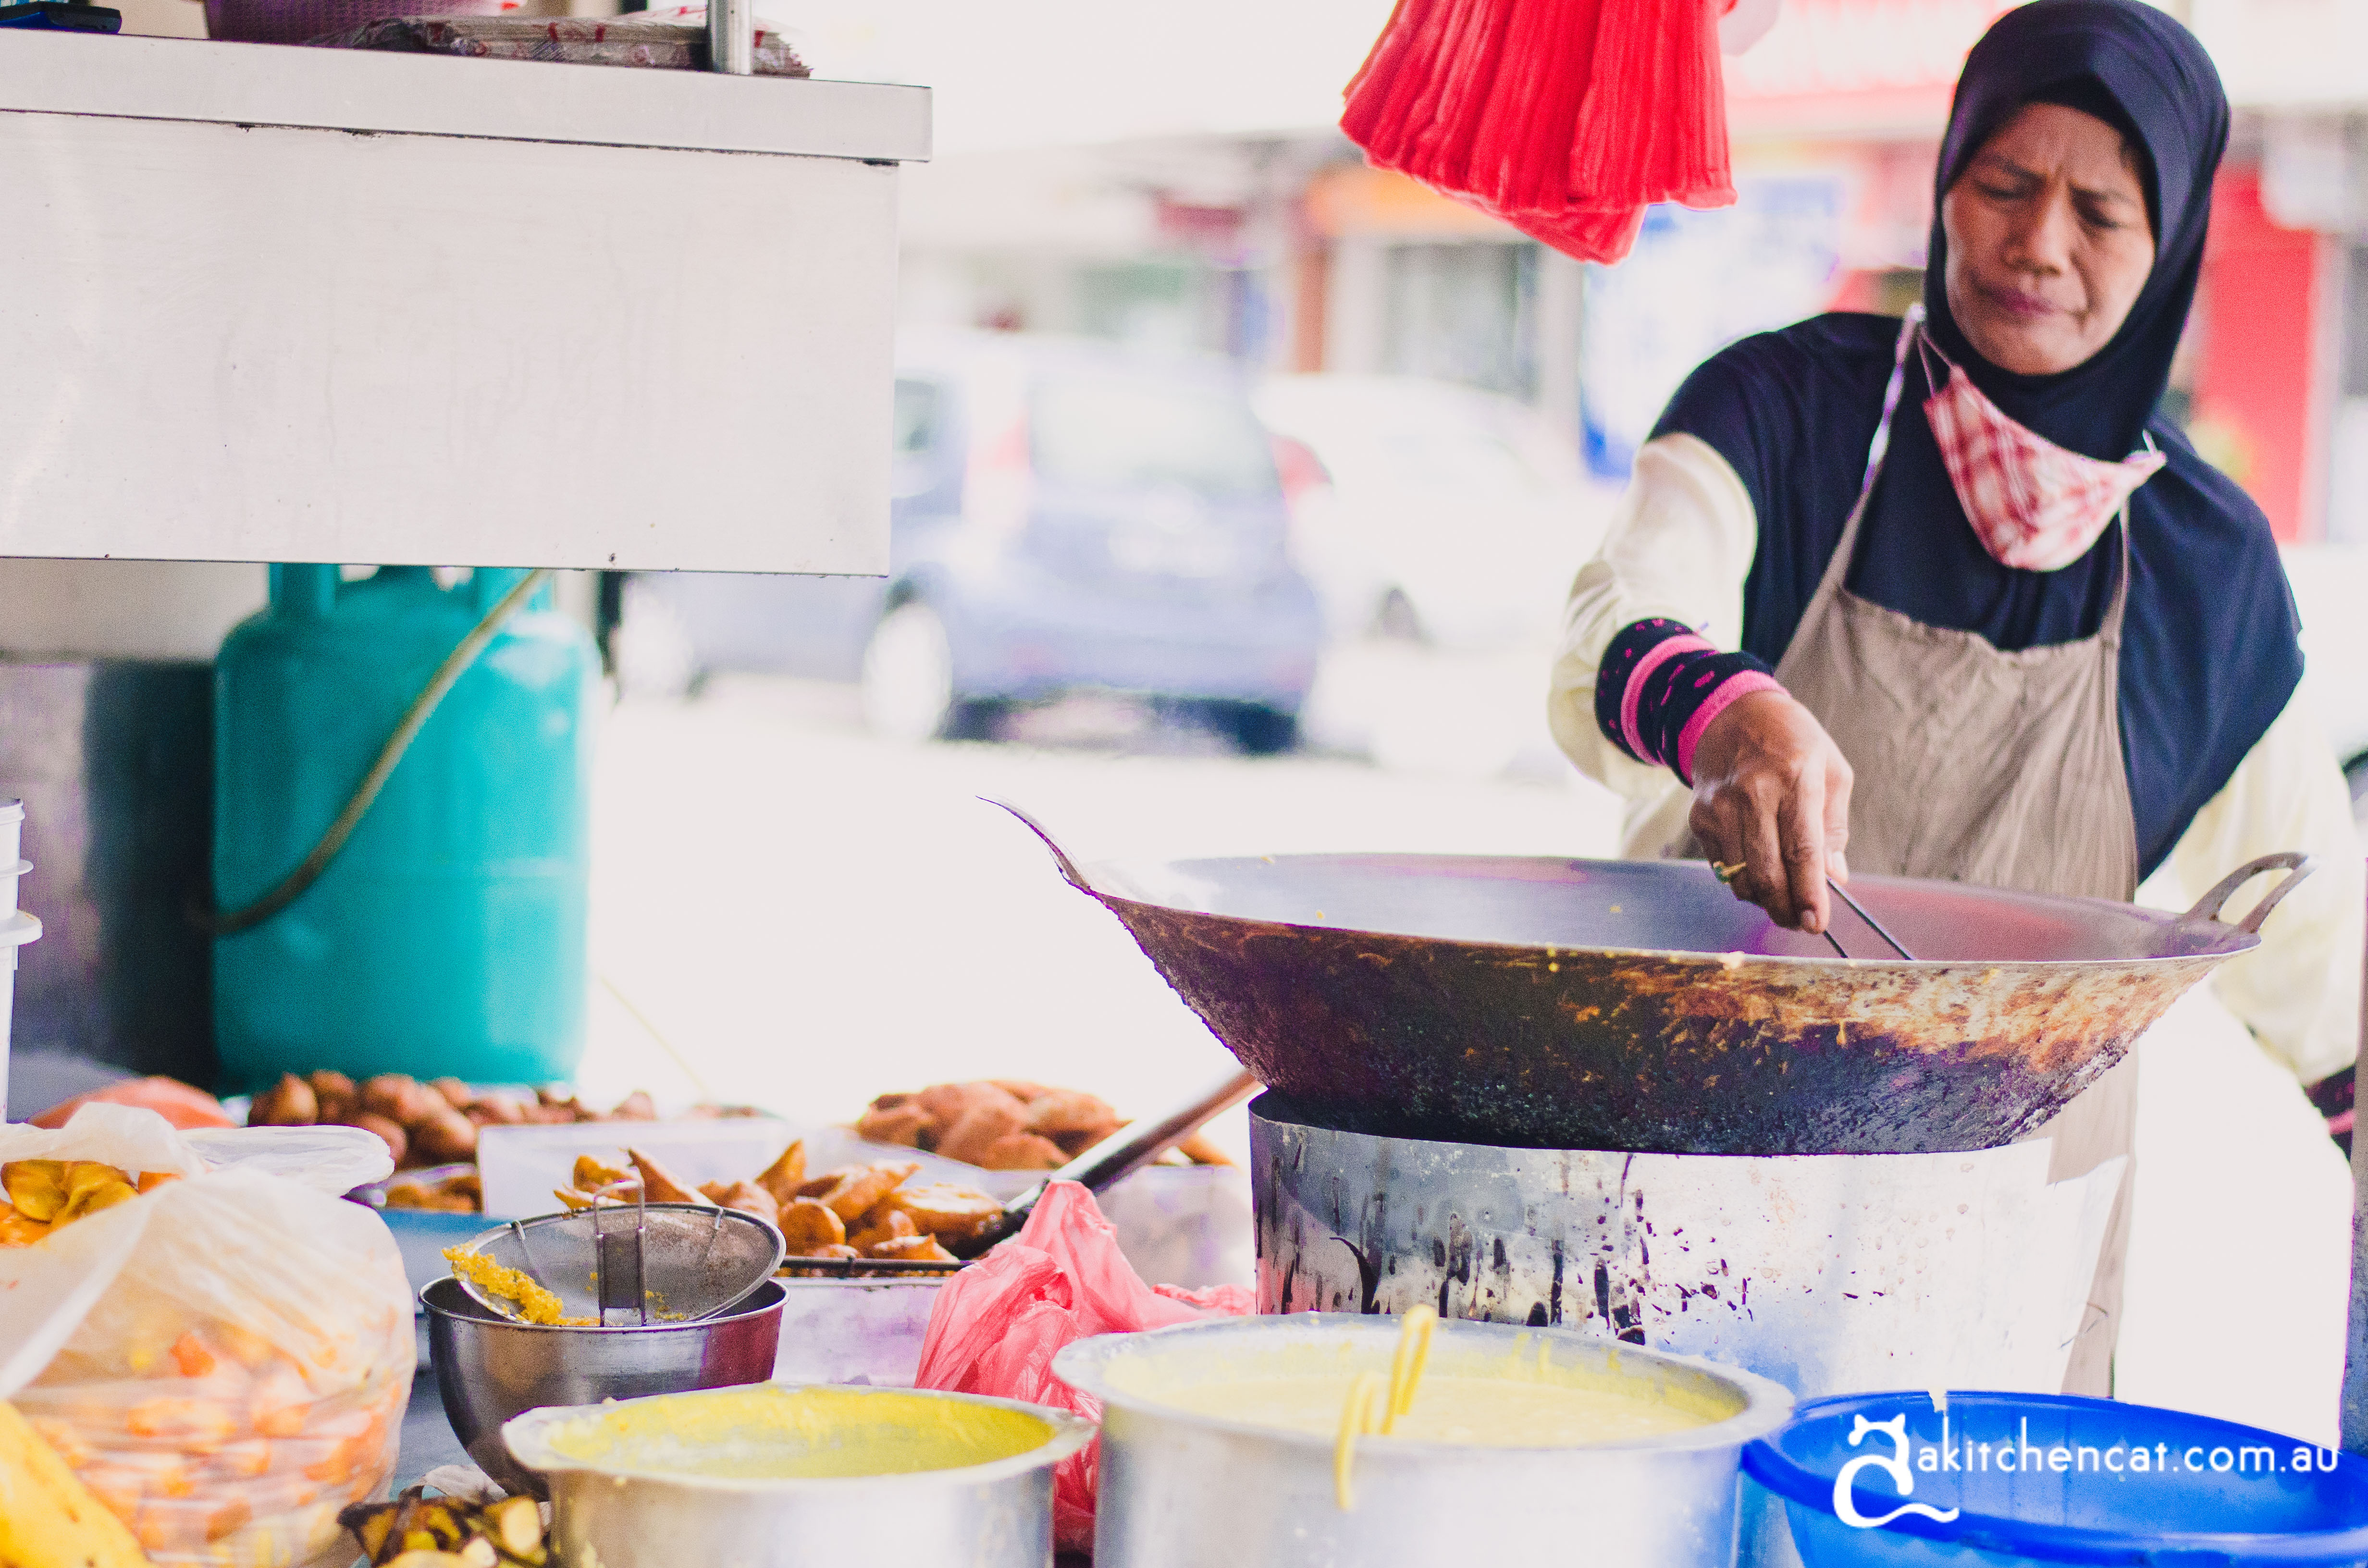 KL street food: a quick look around TTDI | A Kitchen Cat